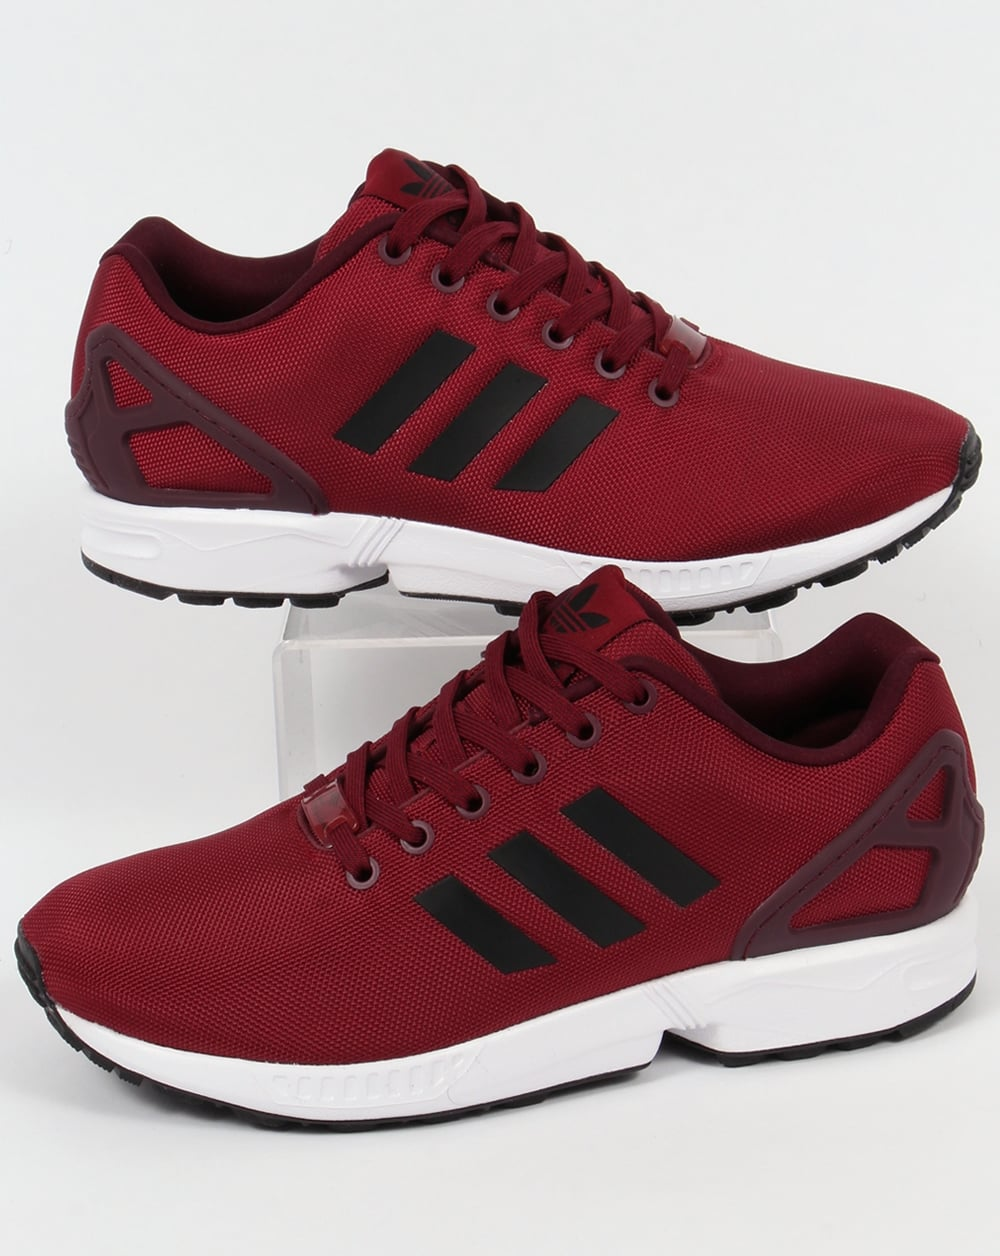 adidas zx flux maroon- OFF 60% - www